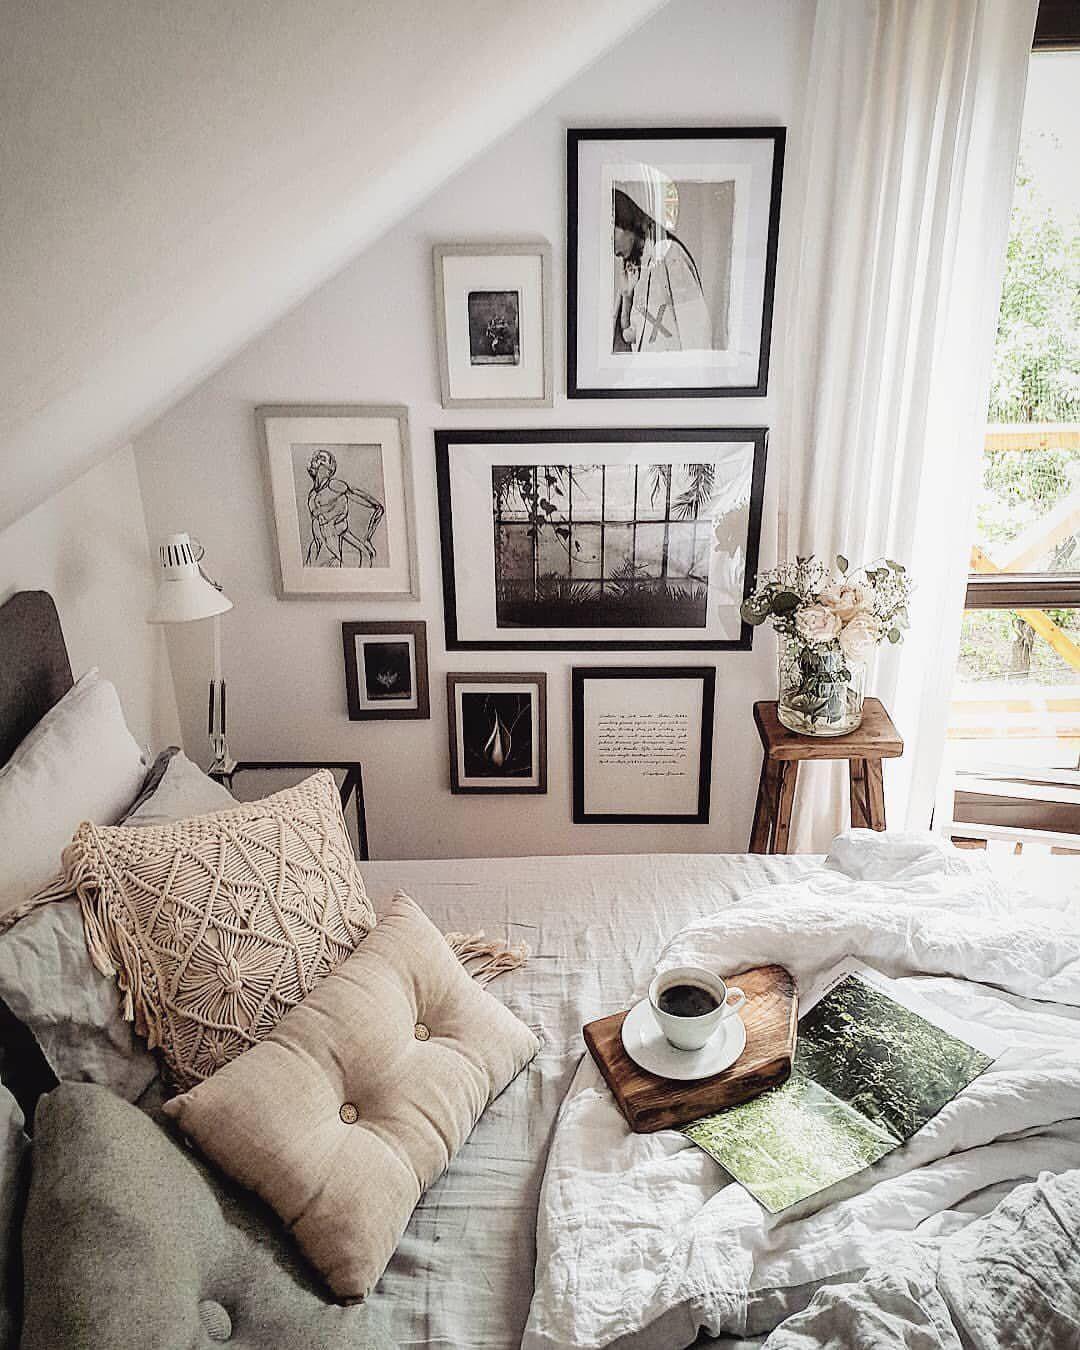 Bedroom Bench Name Bedroom Ideas Cozy Bedroom Ideas Glam Black Leather Bed Bedroom Ideas: Sunday Vibes. (Image: @marzena.marideko).